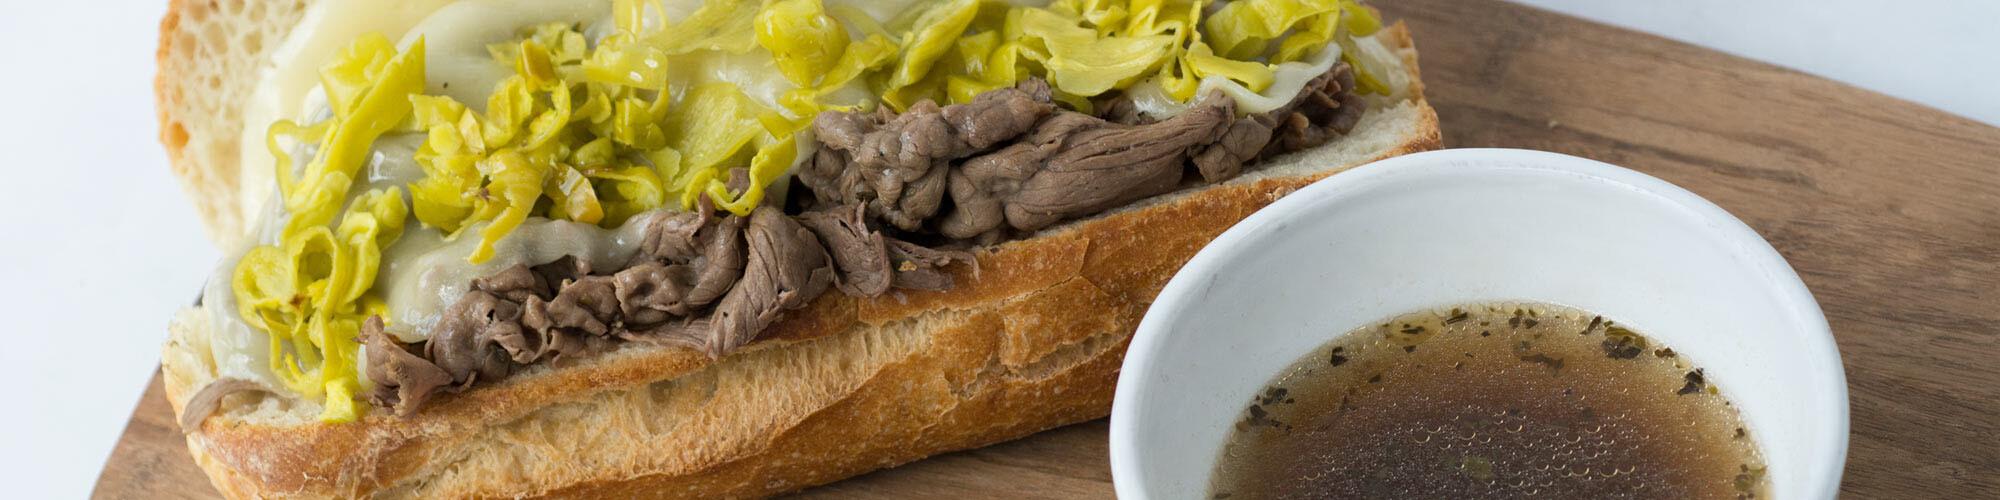 Italian Top Round Drip Sandwich Recipe